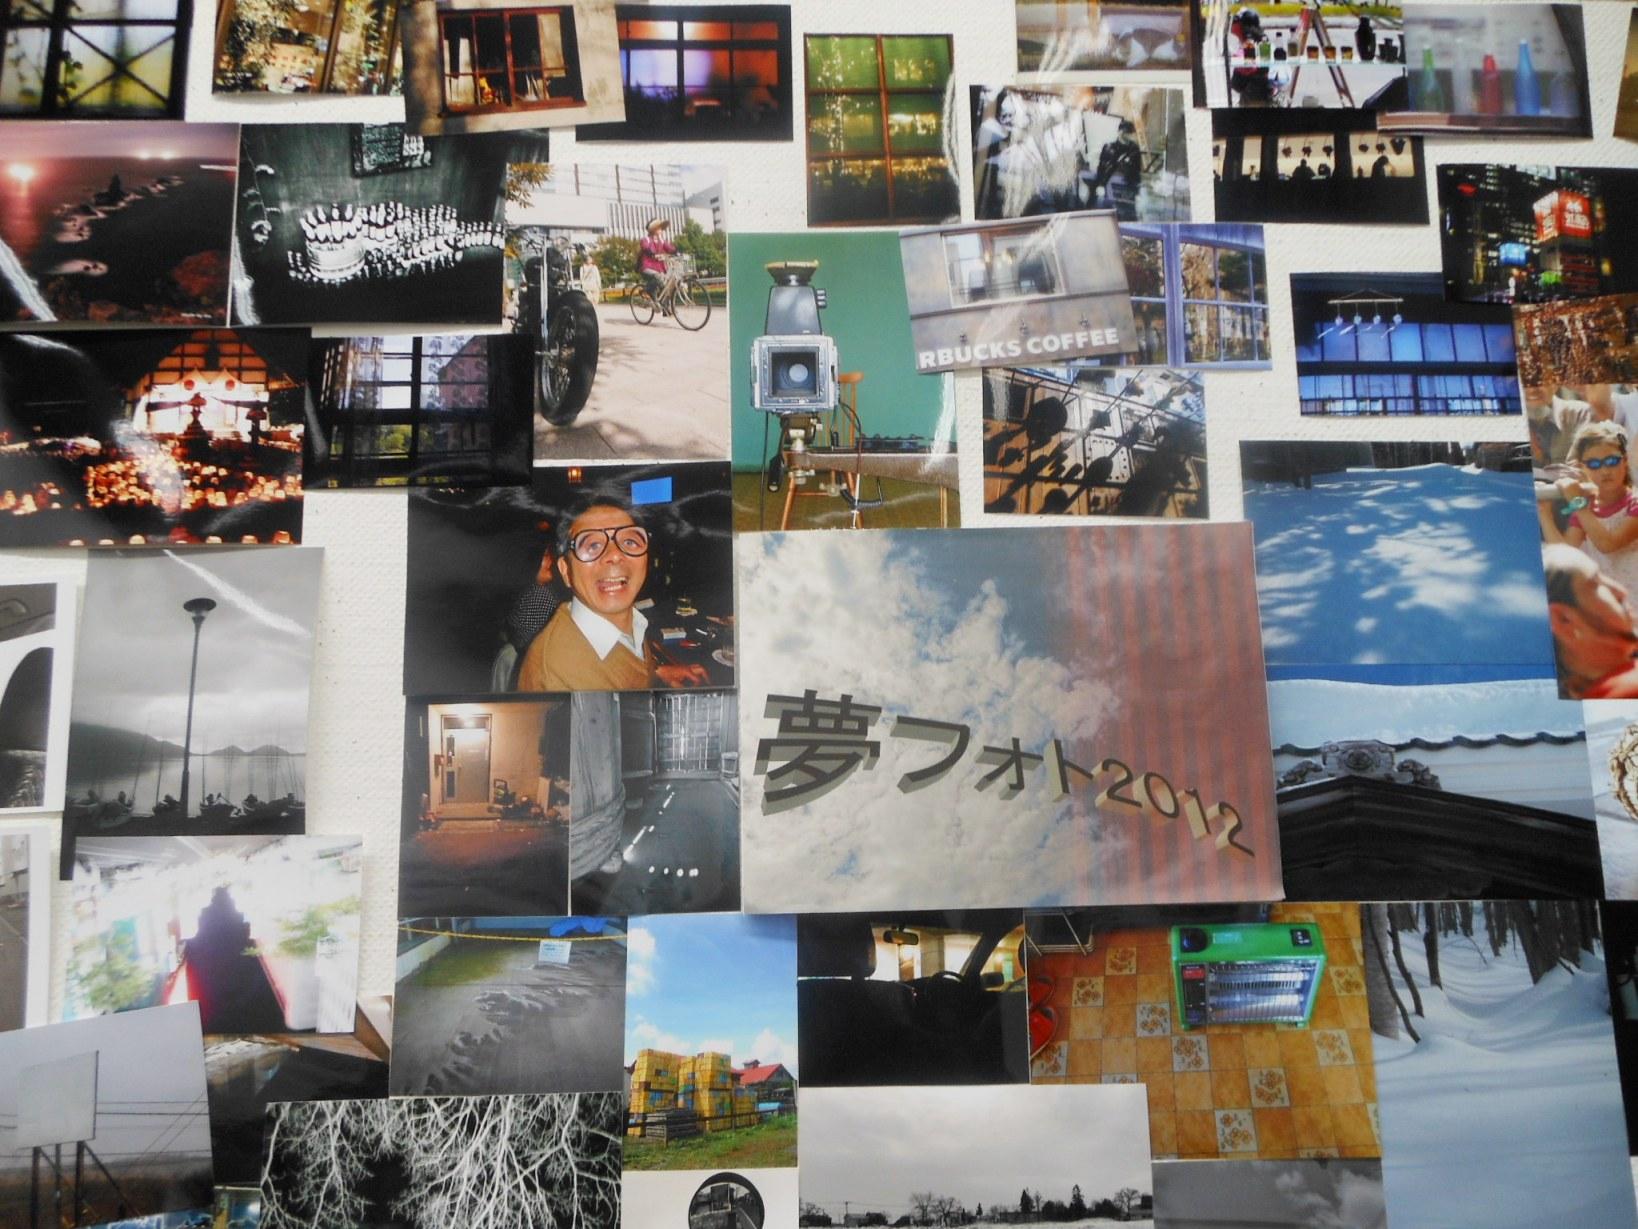 1885)②「写真クラブ「BePHaT!!」 第9回作品展 『夢 Photo 2012』」市民g. 終了11月21日(水)~11月25日(日)_f0126829_2233556.jpg